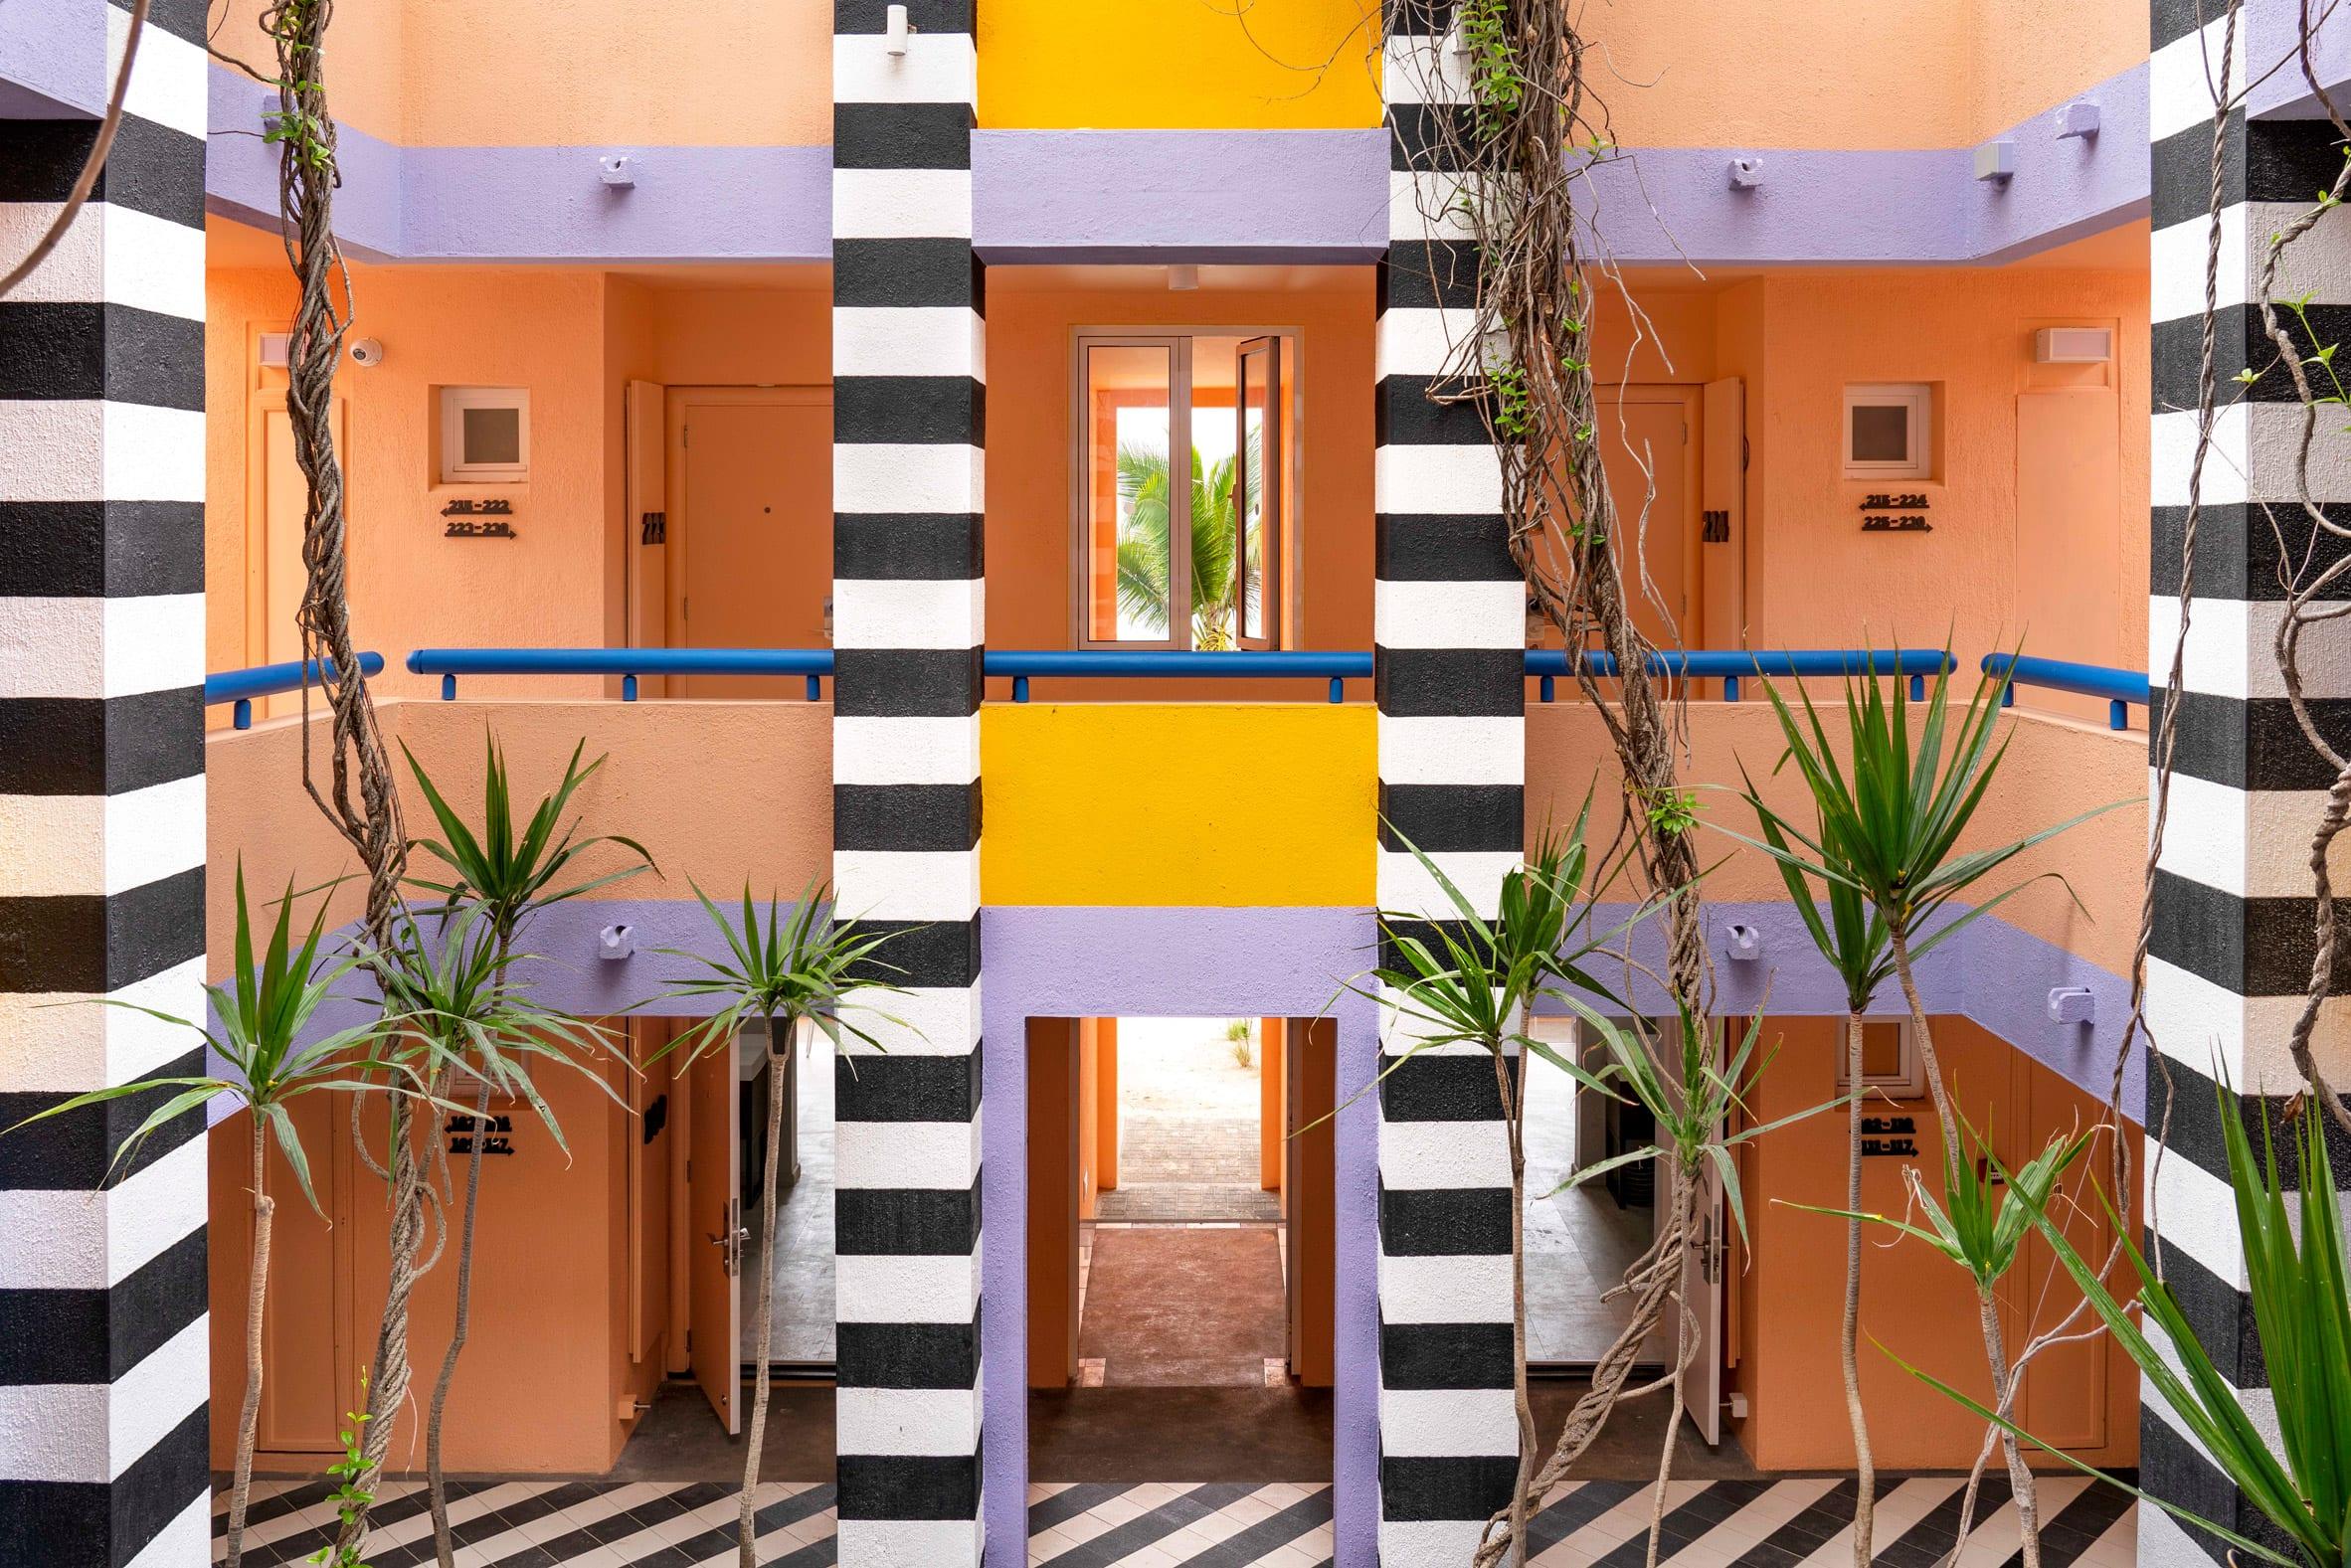 Salt Palmar Hotels Mauritius - Memphis design